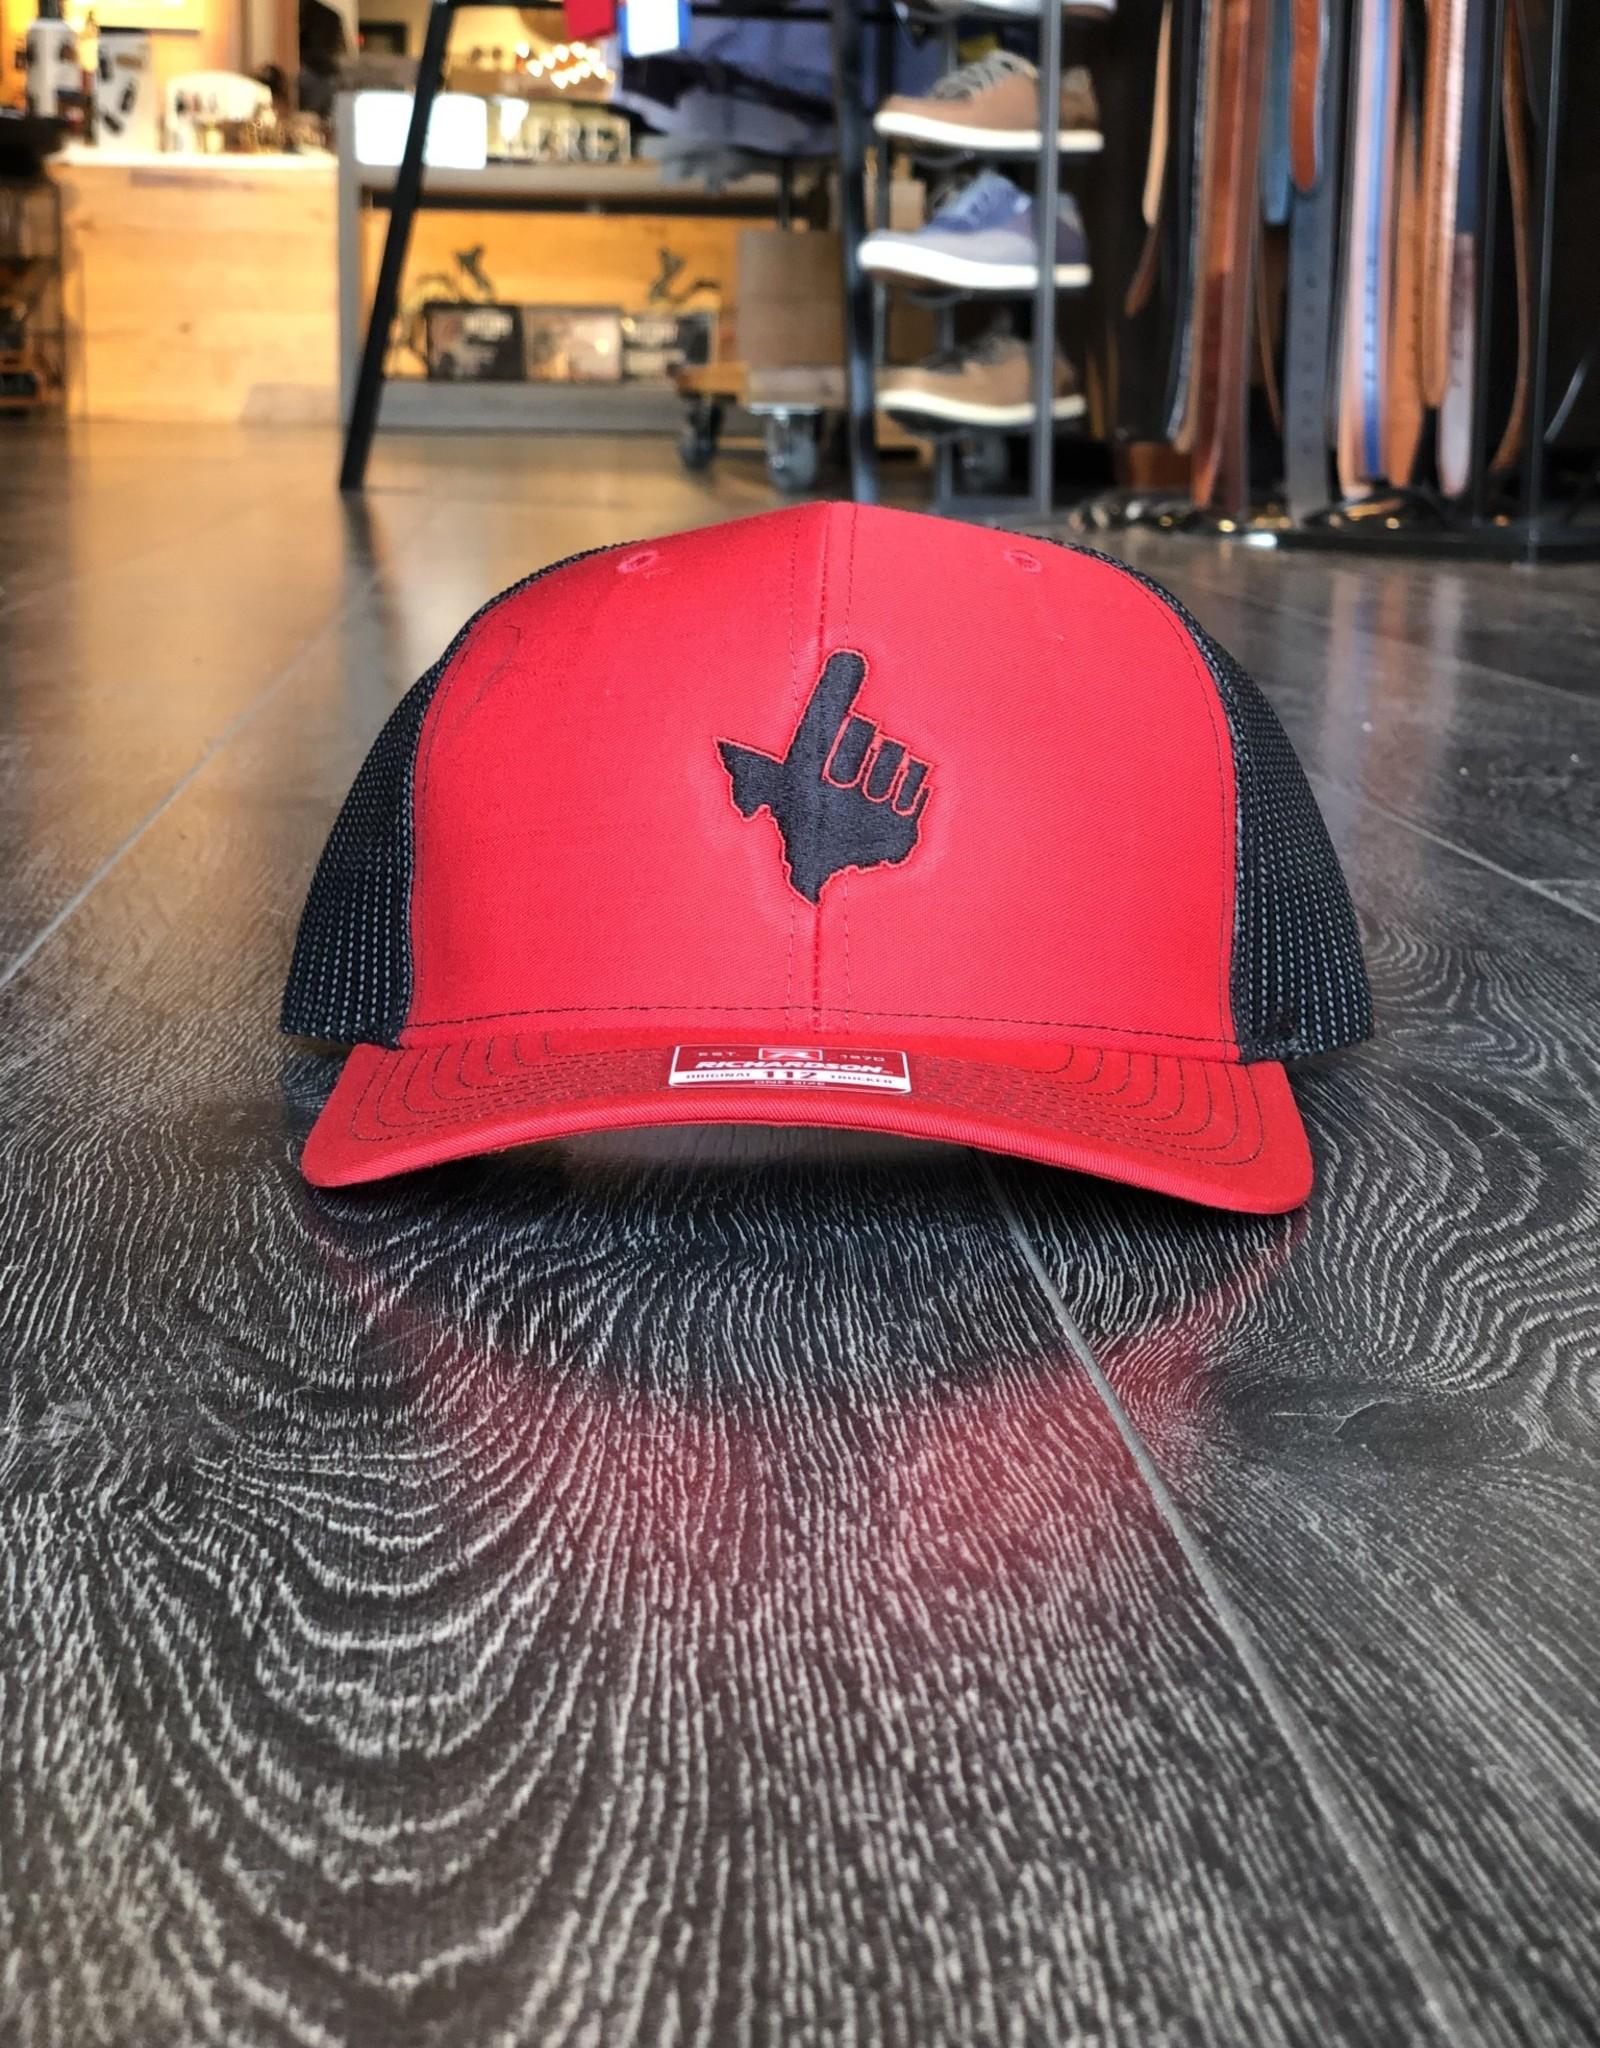 Stag GameDay Richardson 112 Trucker Hat Red/Black Texas Hand